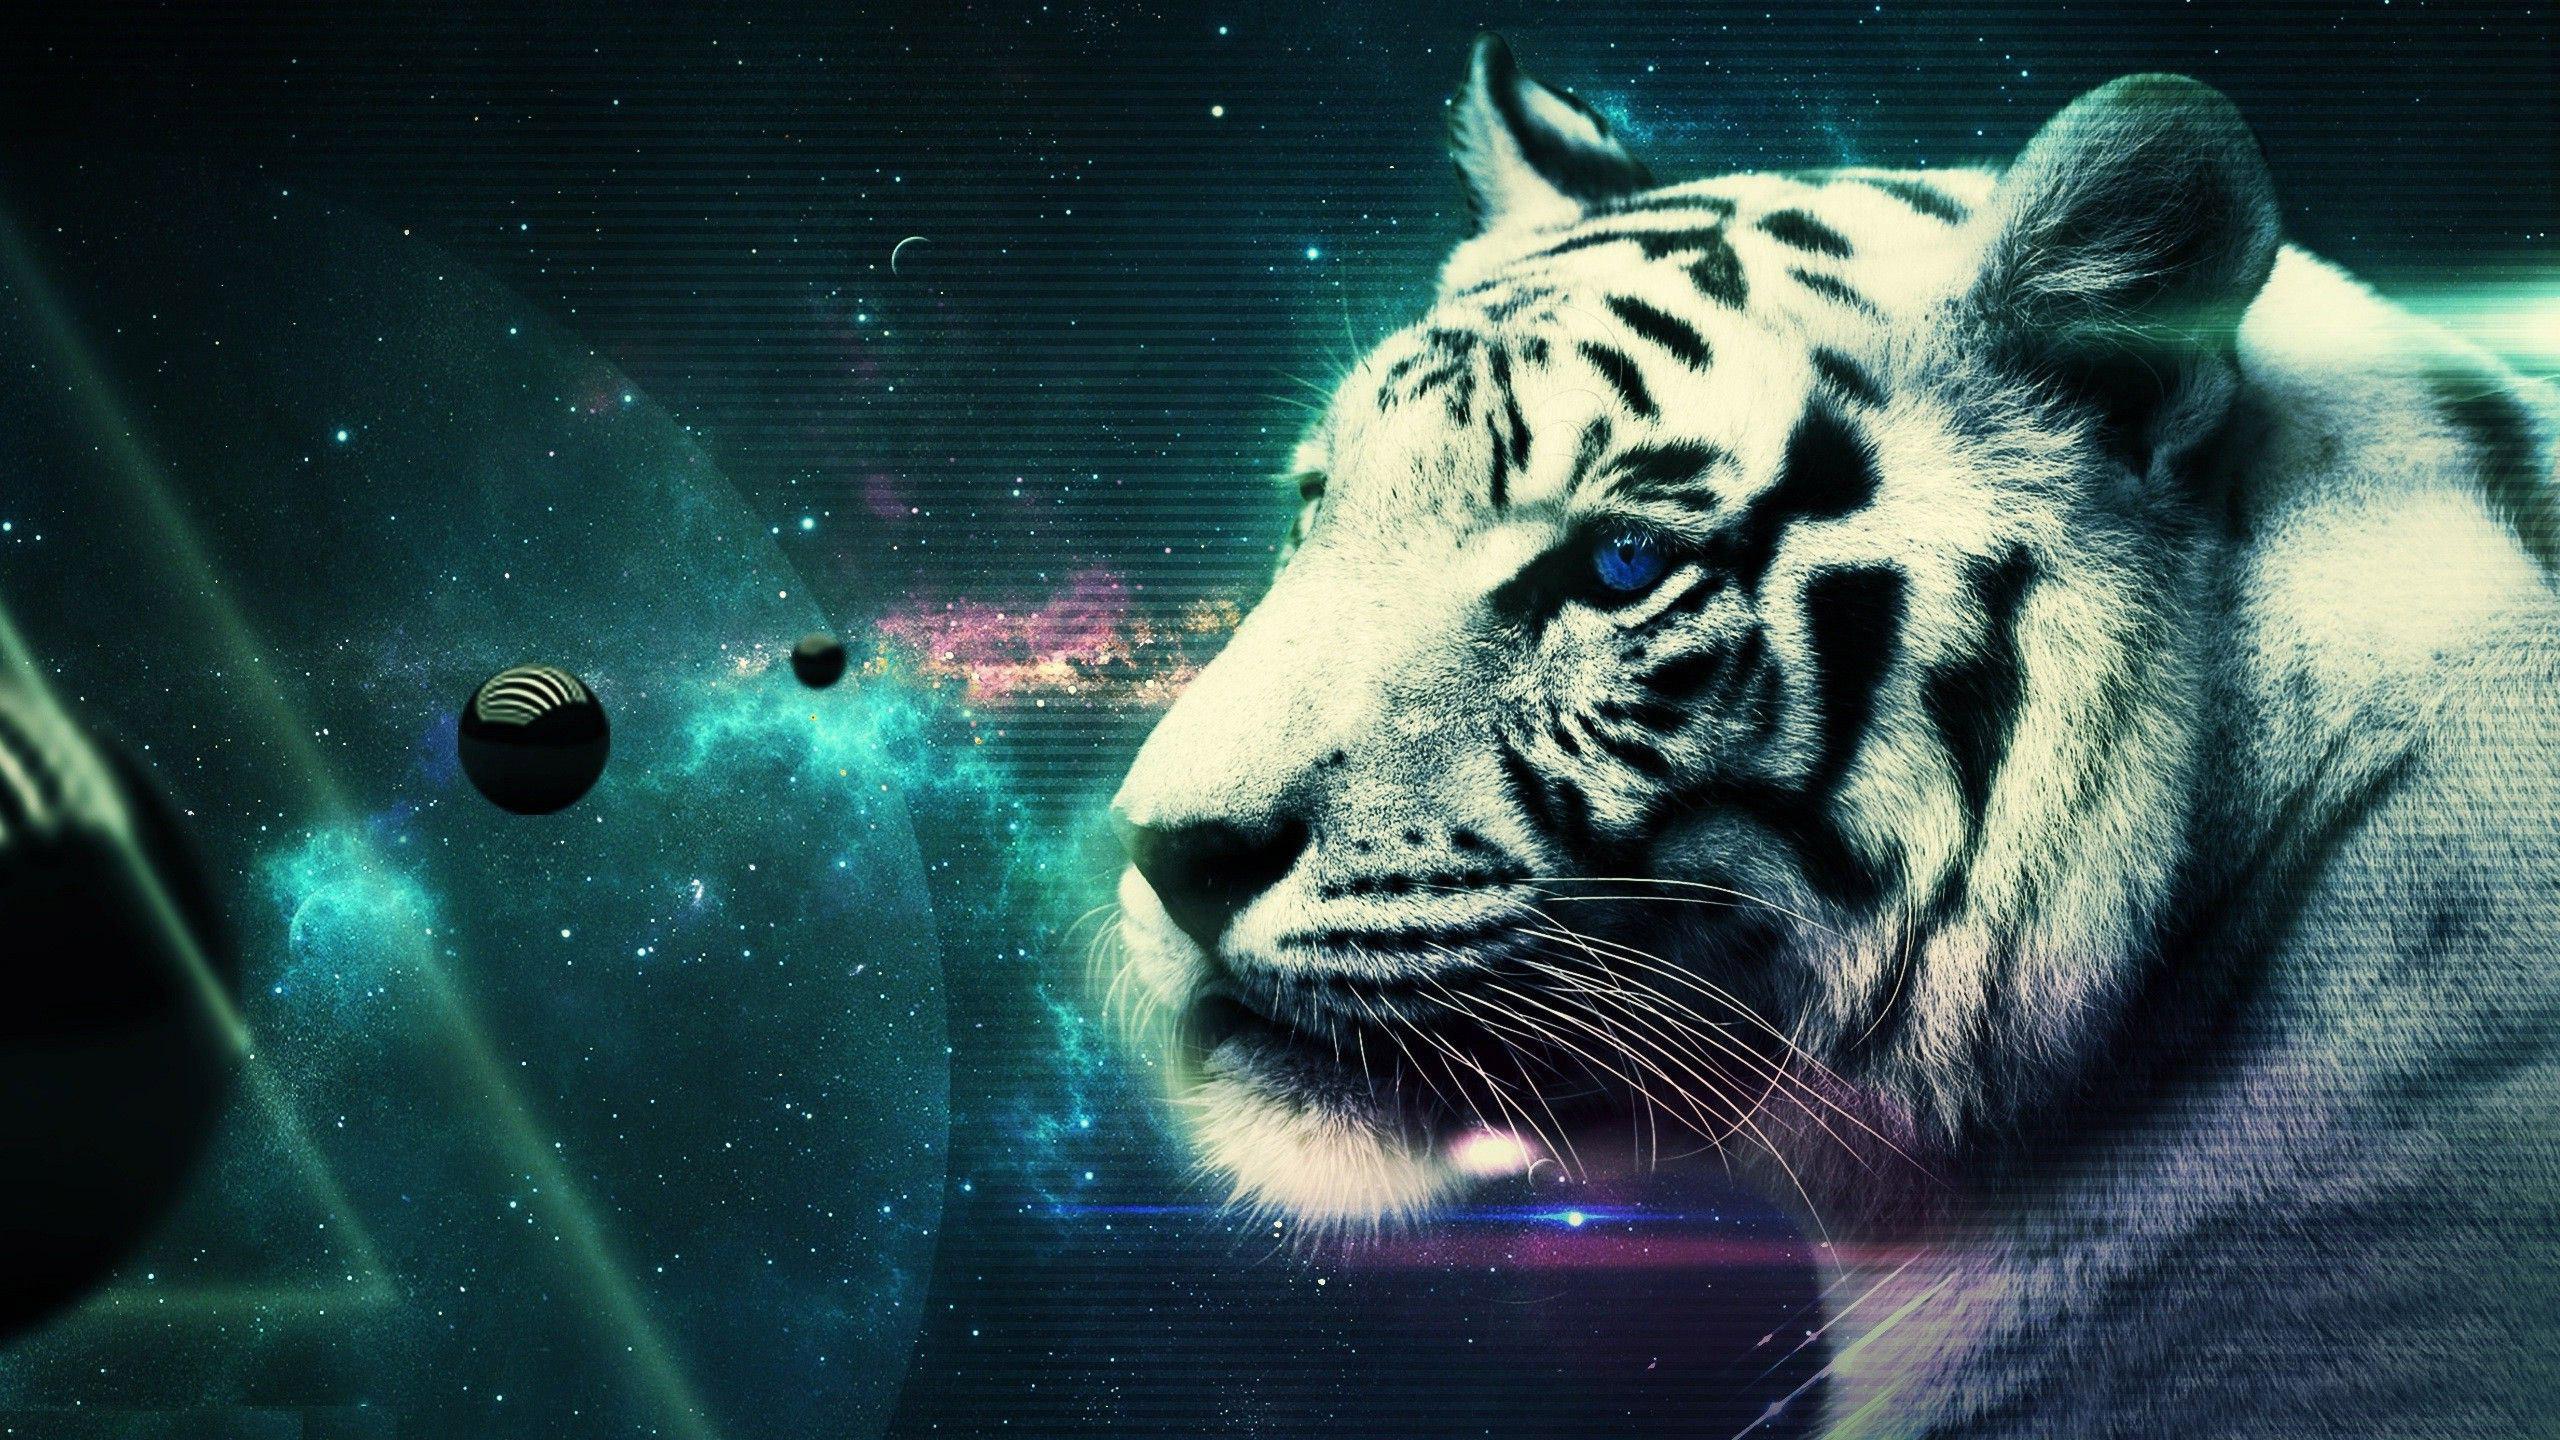 0 Tiger wallpapers hd free download White Tiger Wallpapers HD Animals  Wallpaper